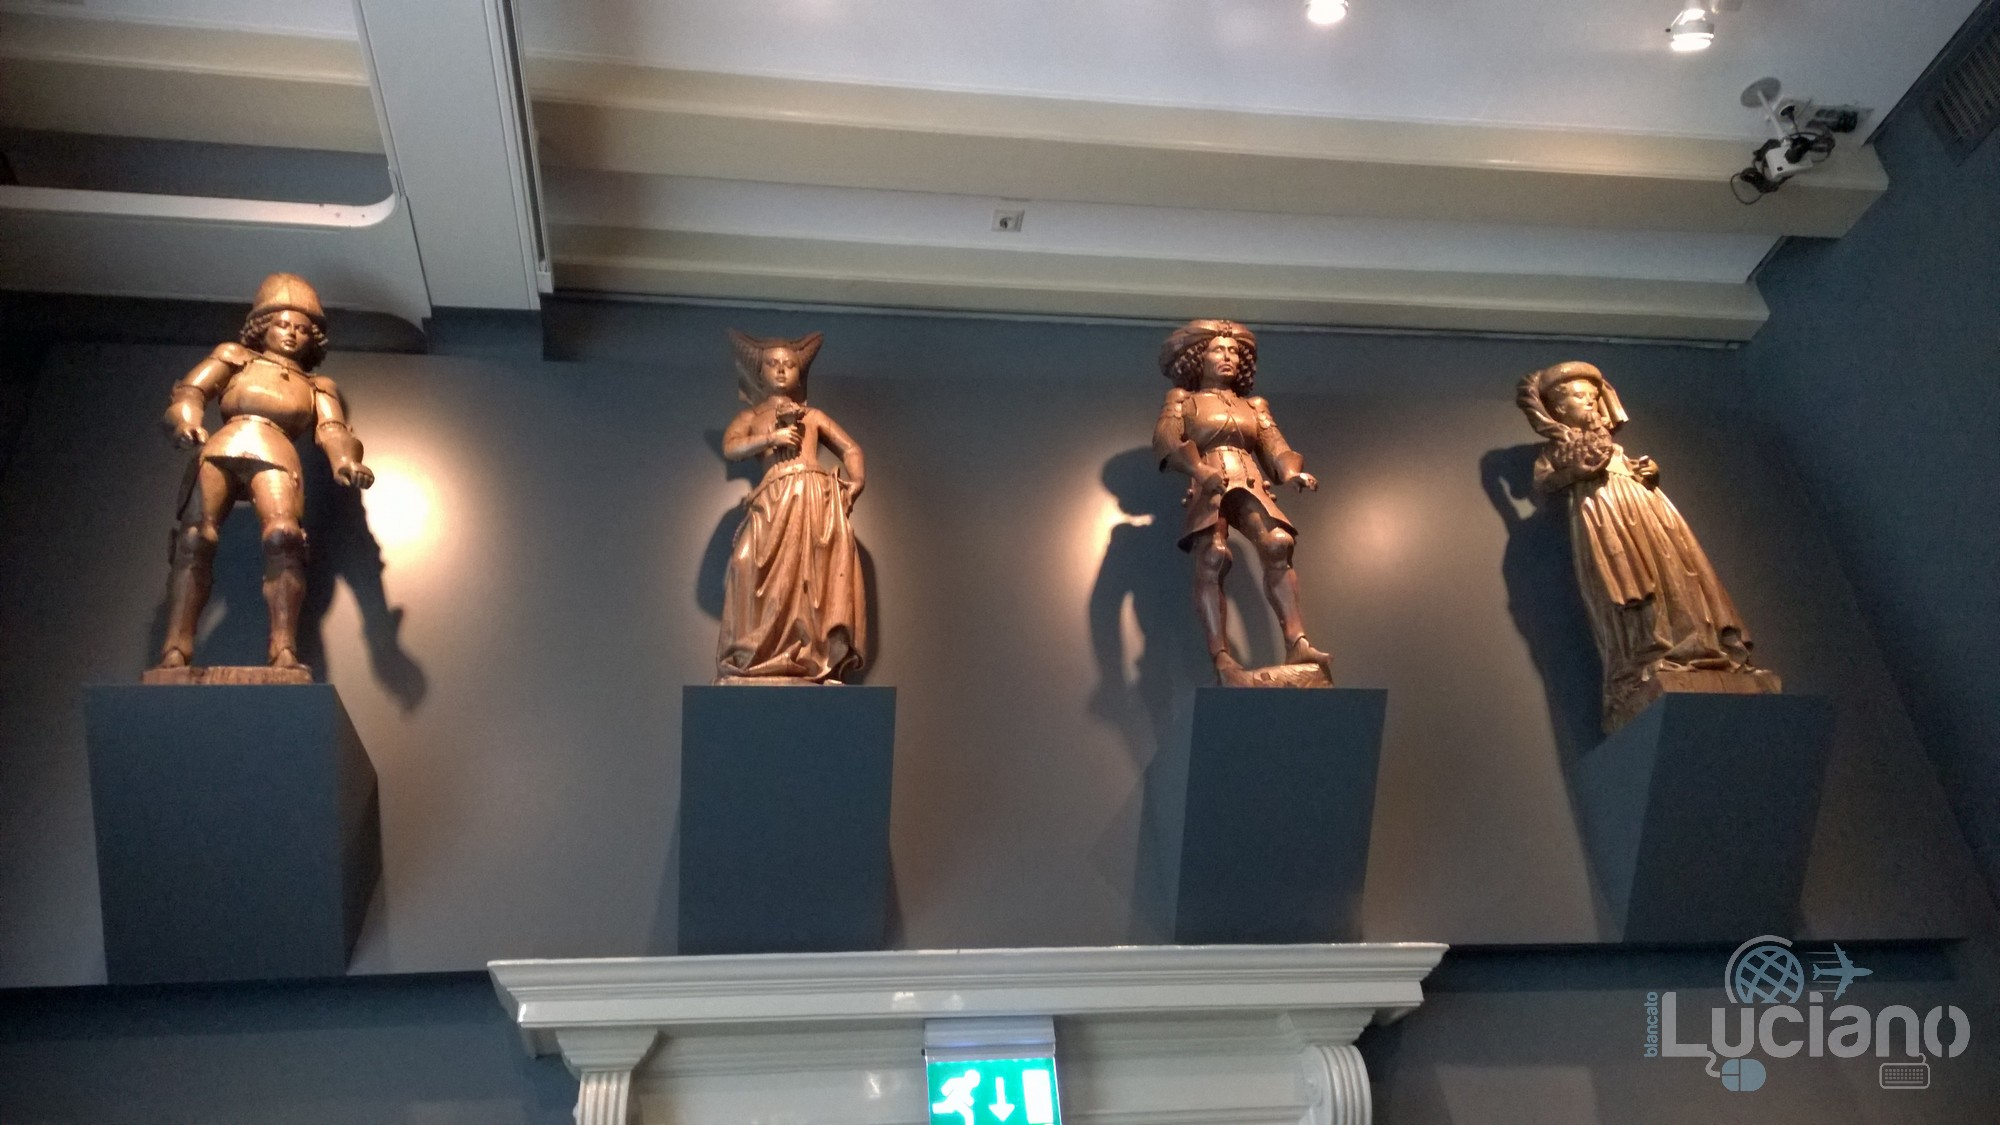 amsterdam-2014-vueling-lucianoblancatoit (103)